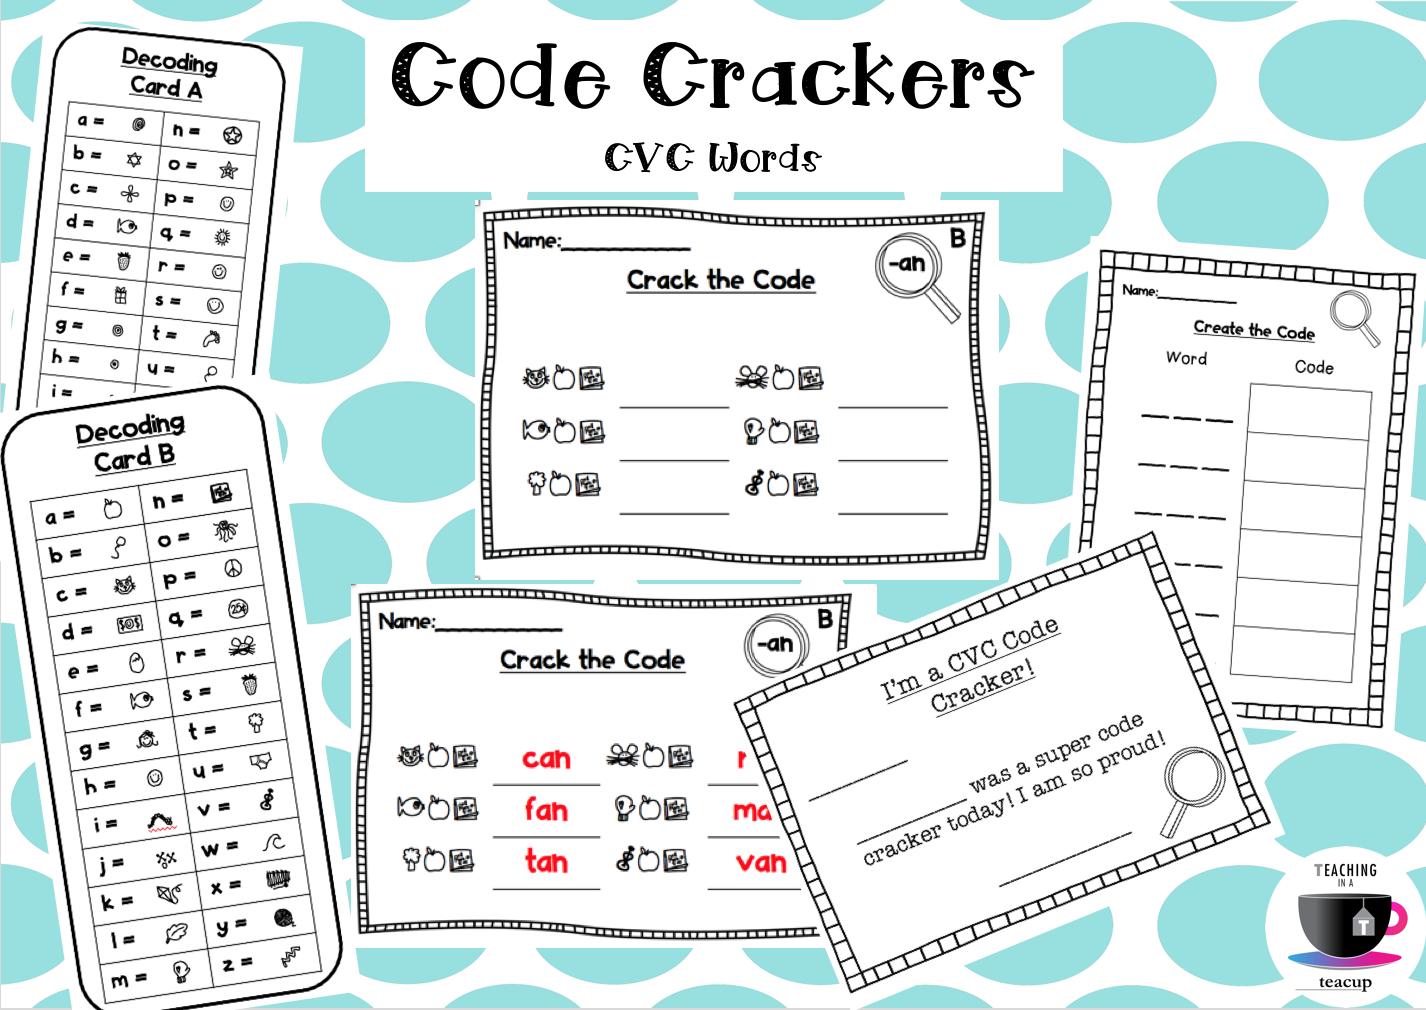 Code Crackers Cvc Words